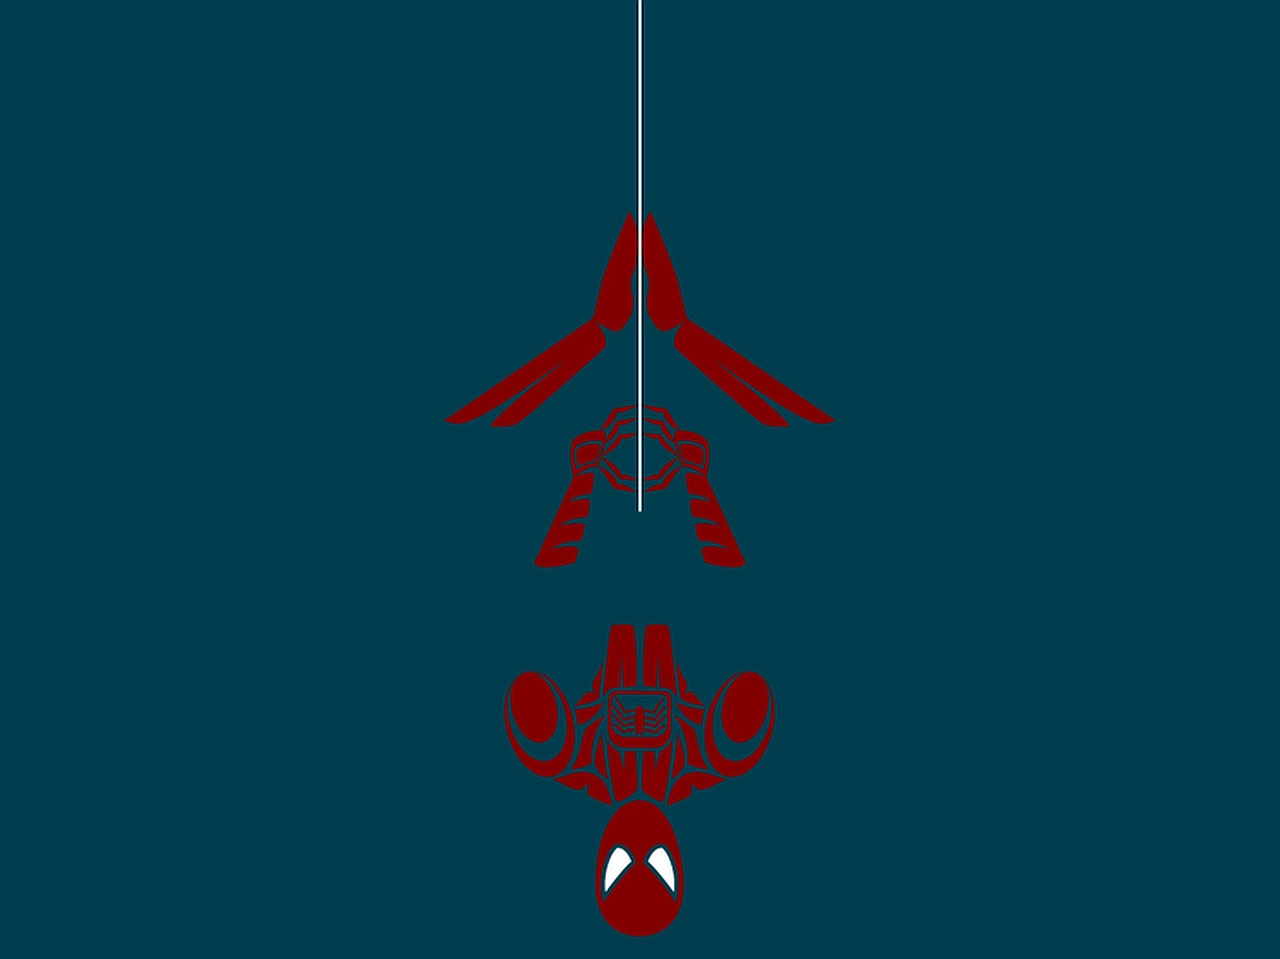 Venom iphone wallpaper wallpapersafari - Spiderman iphone x wallpaper ...